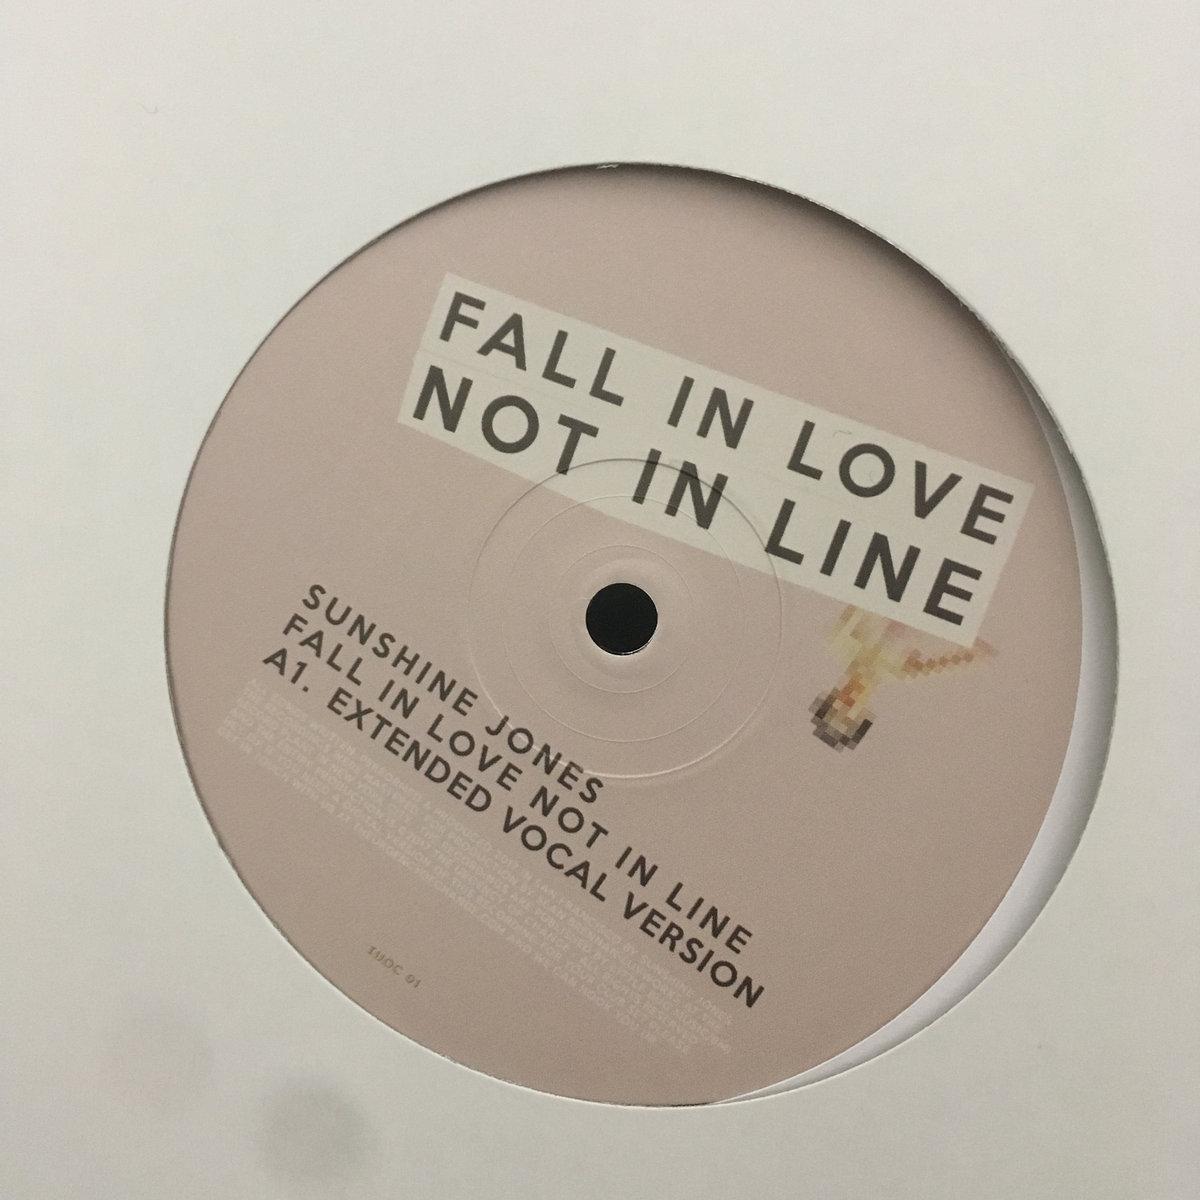 B1 FALL IN LOVE NOT IN LINE - Sunshine's Soul Mix | Sunshine